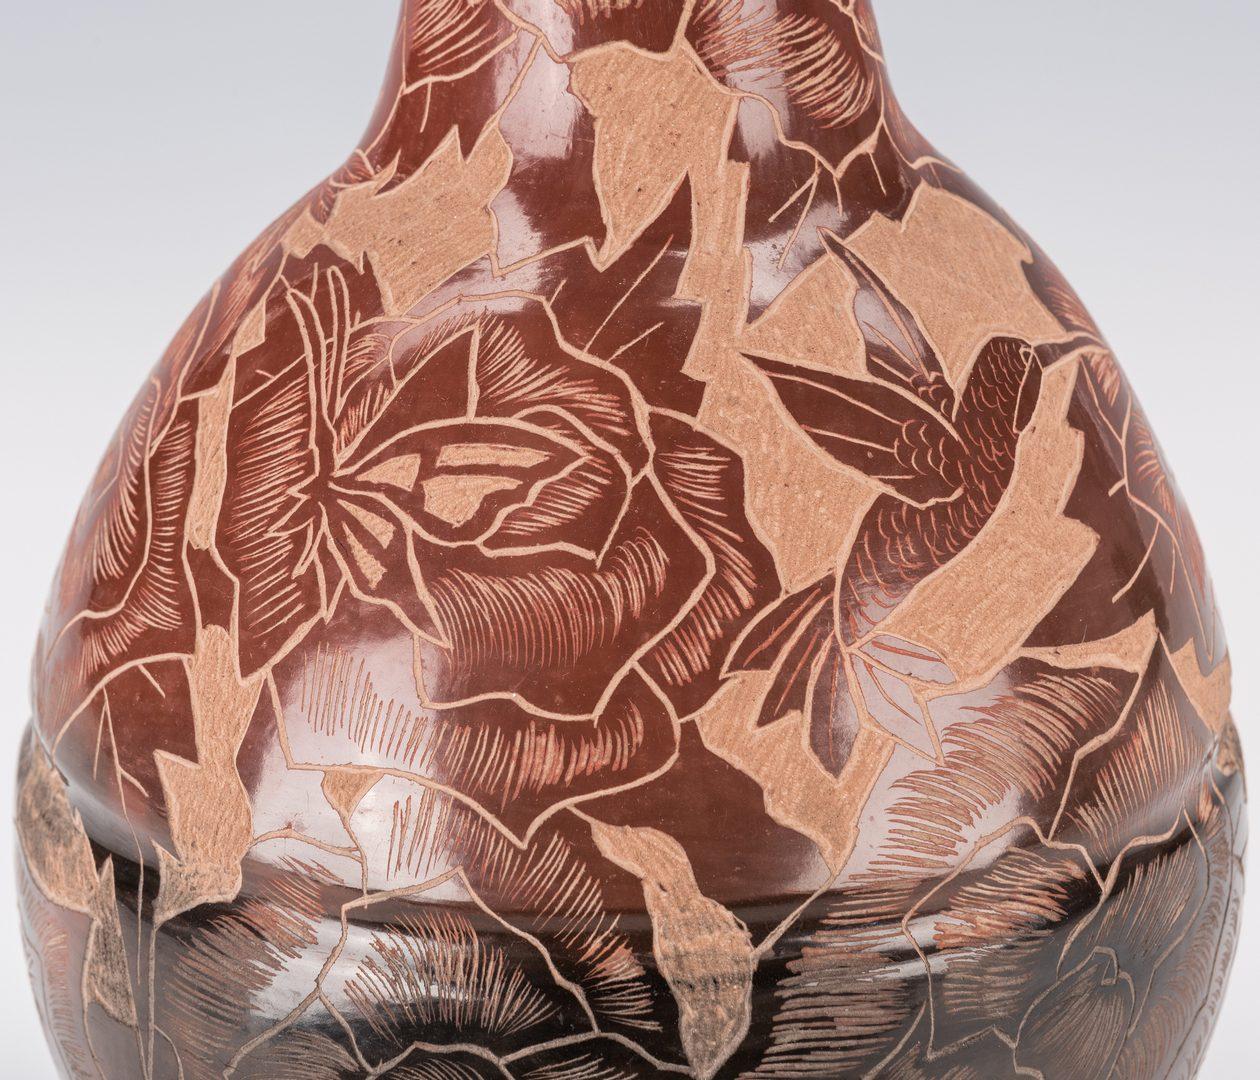 Lot 702: 2 Gwen Tafoya Santa Clara Pottery Pcs.